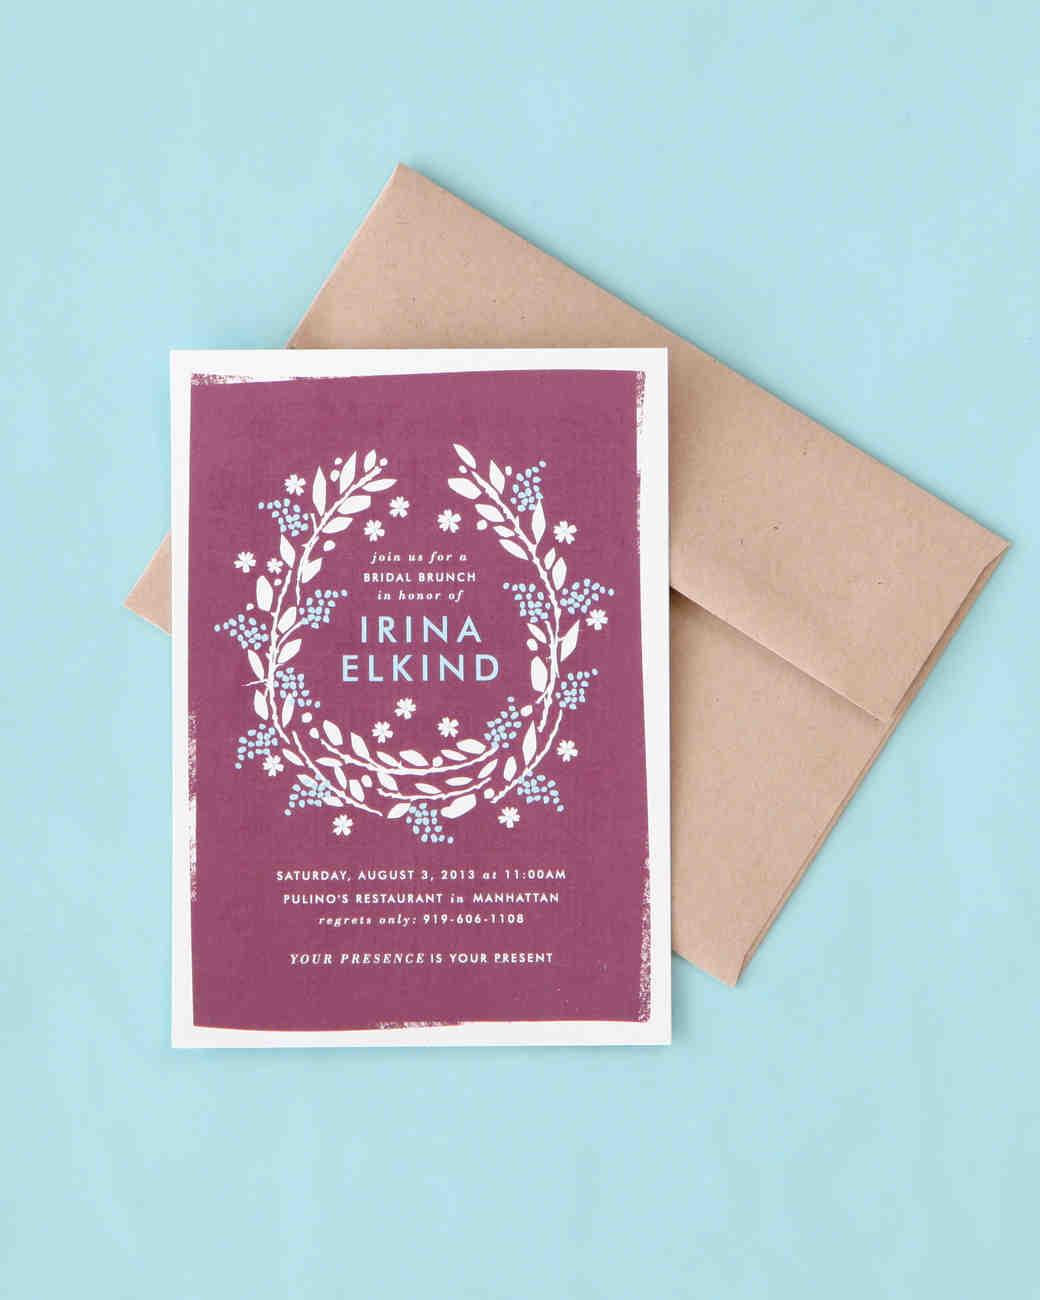 Bridal Shower Invitation Wording Made Simple Martha Stewart Weddings